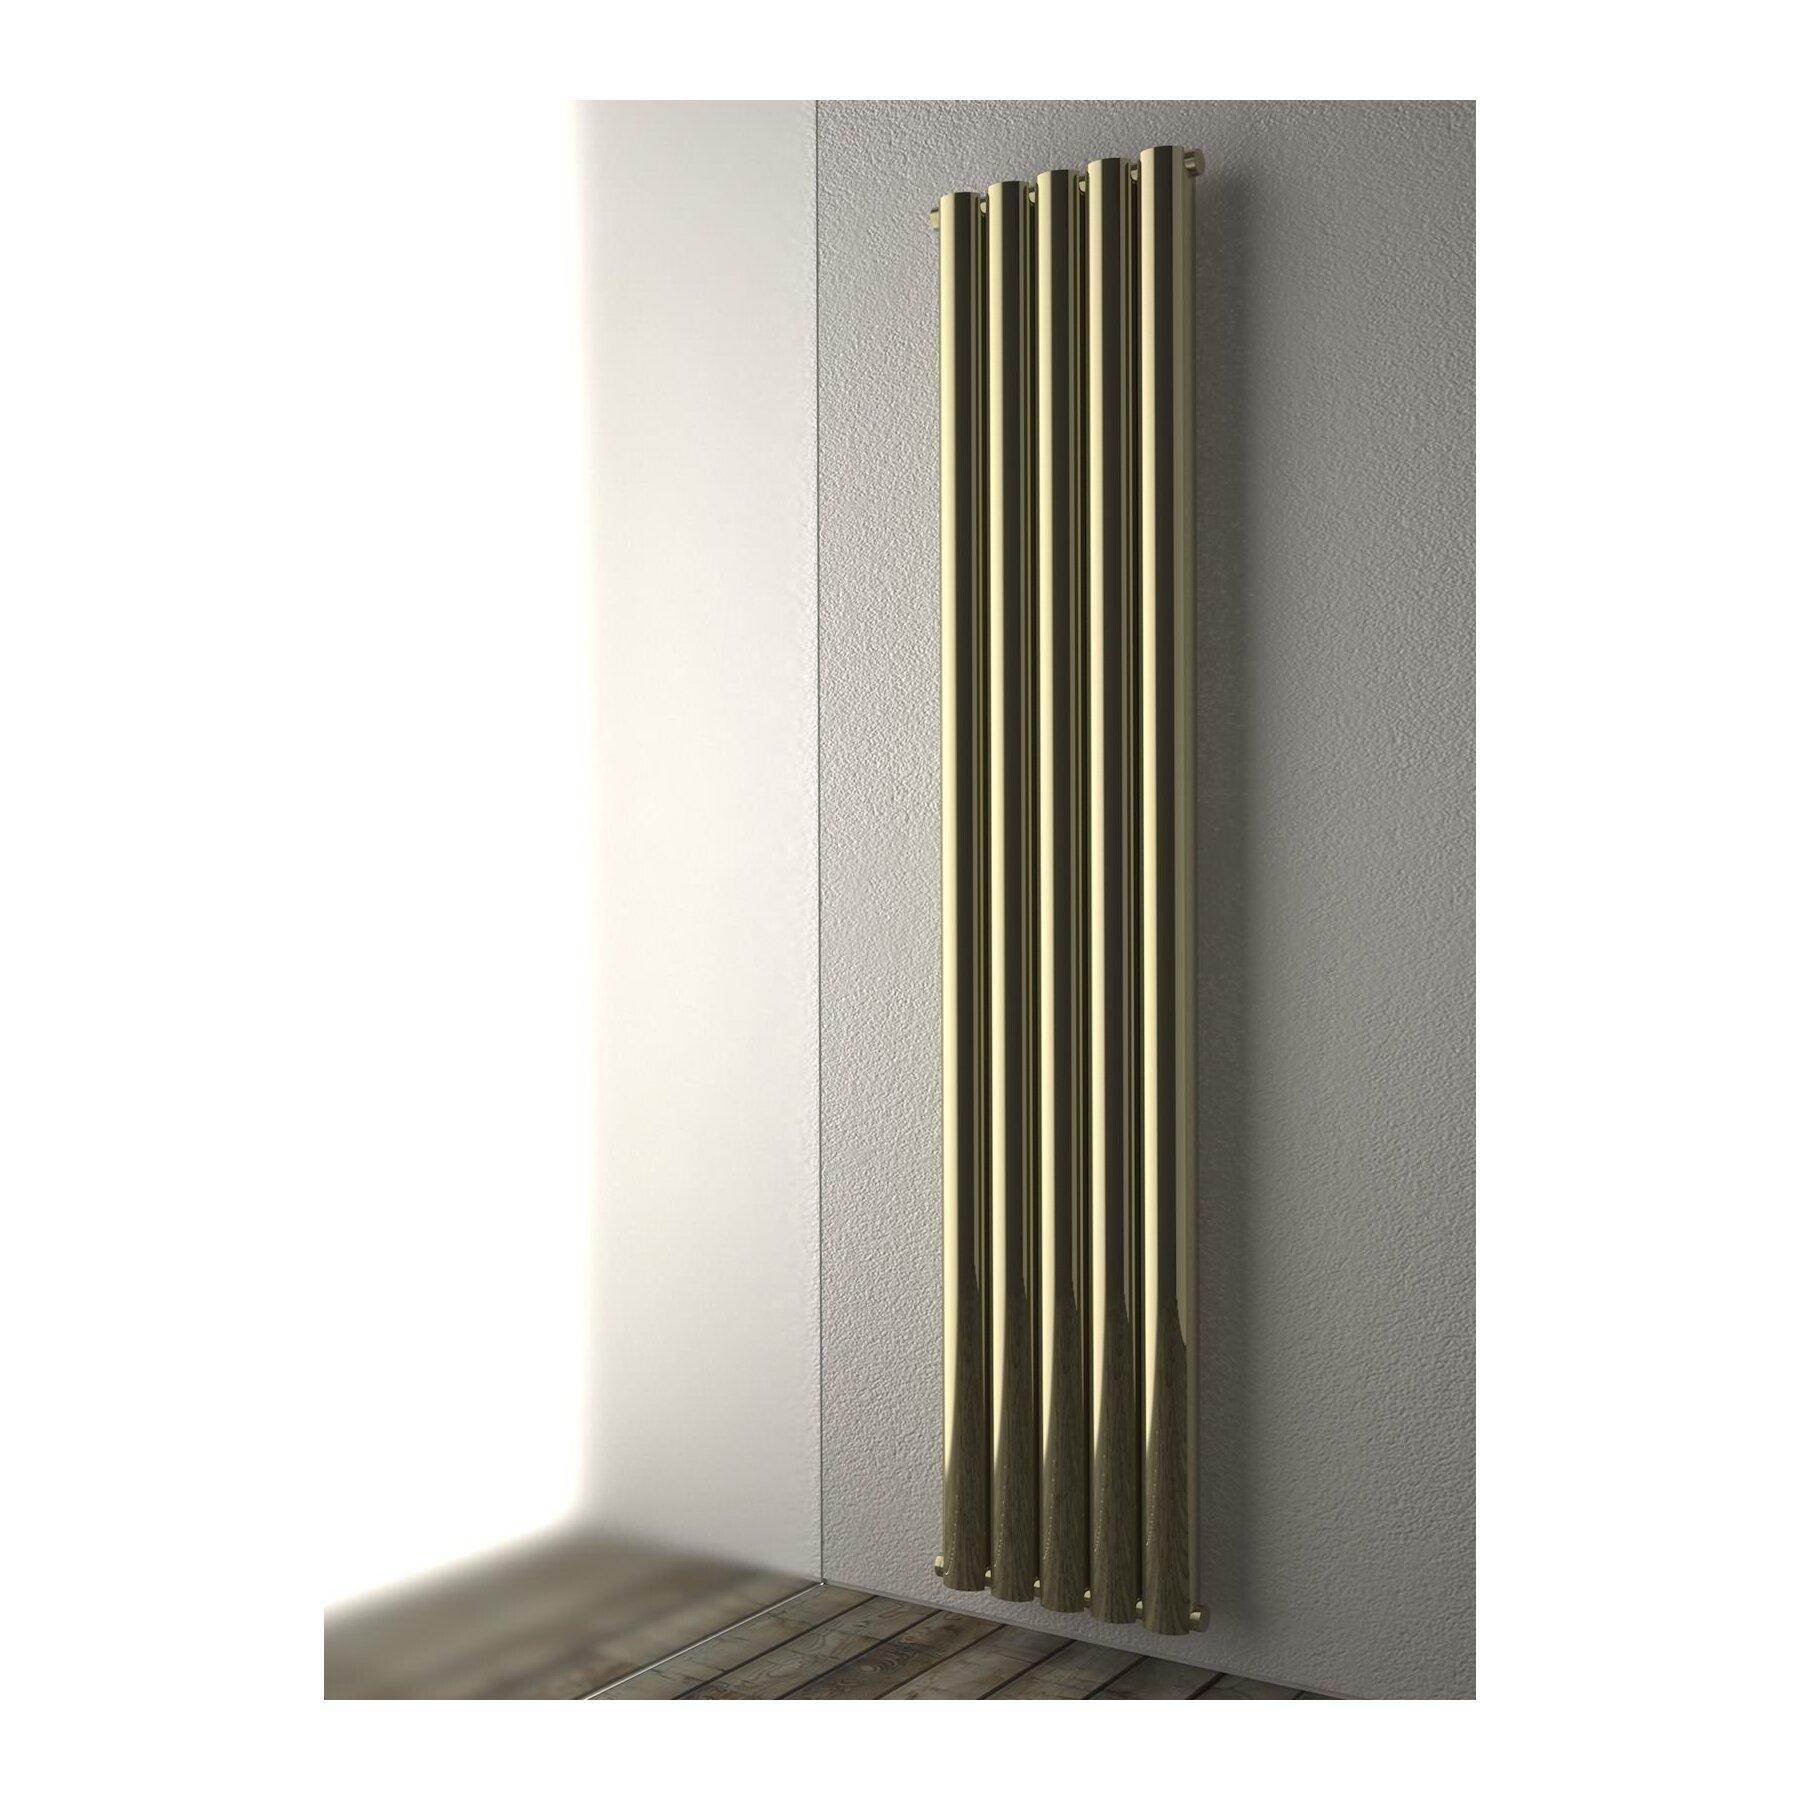 circle moderner r hrenheizk rper von k8 radiatori. Black Bedroom Furniture Sets. Home Design Ideas